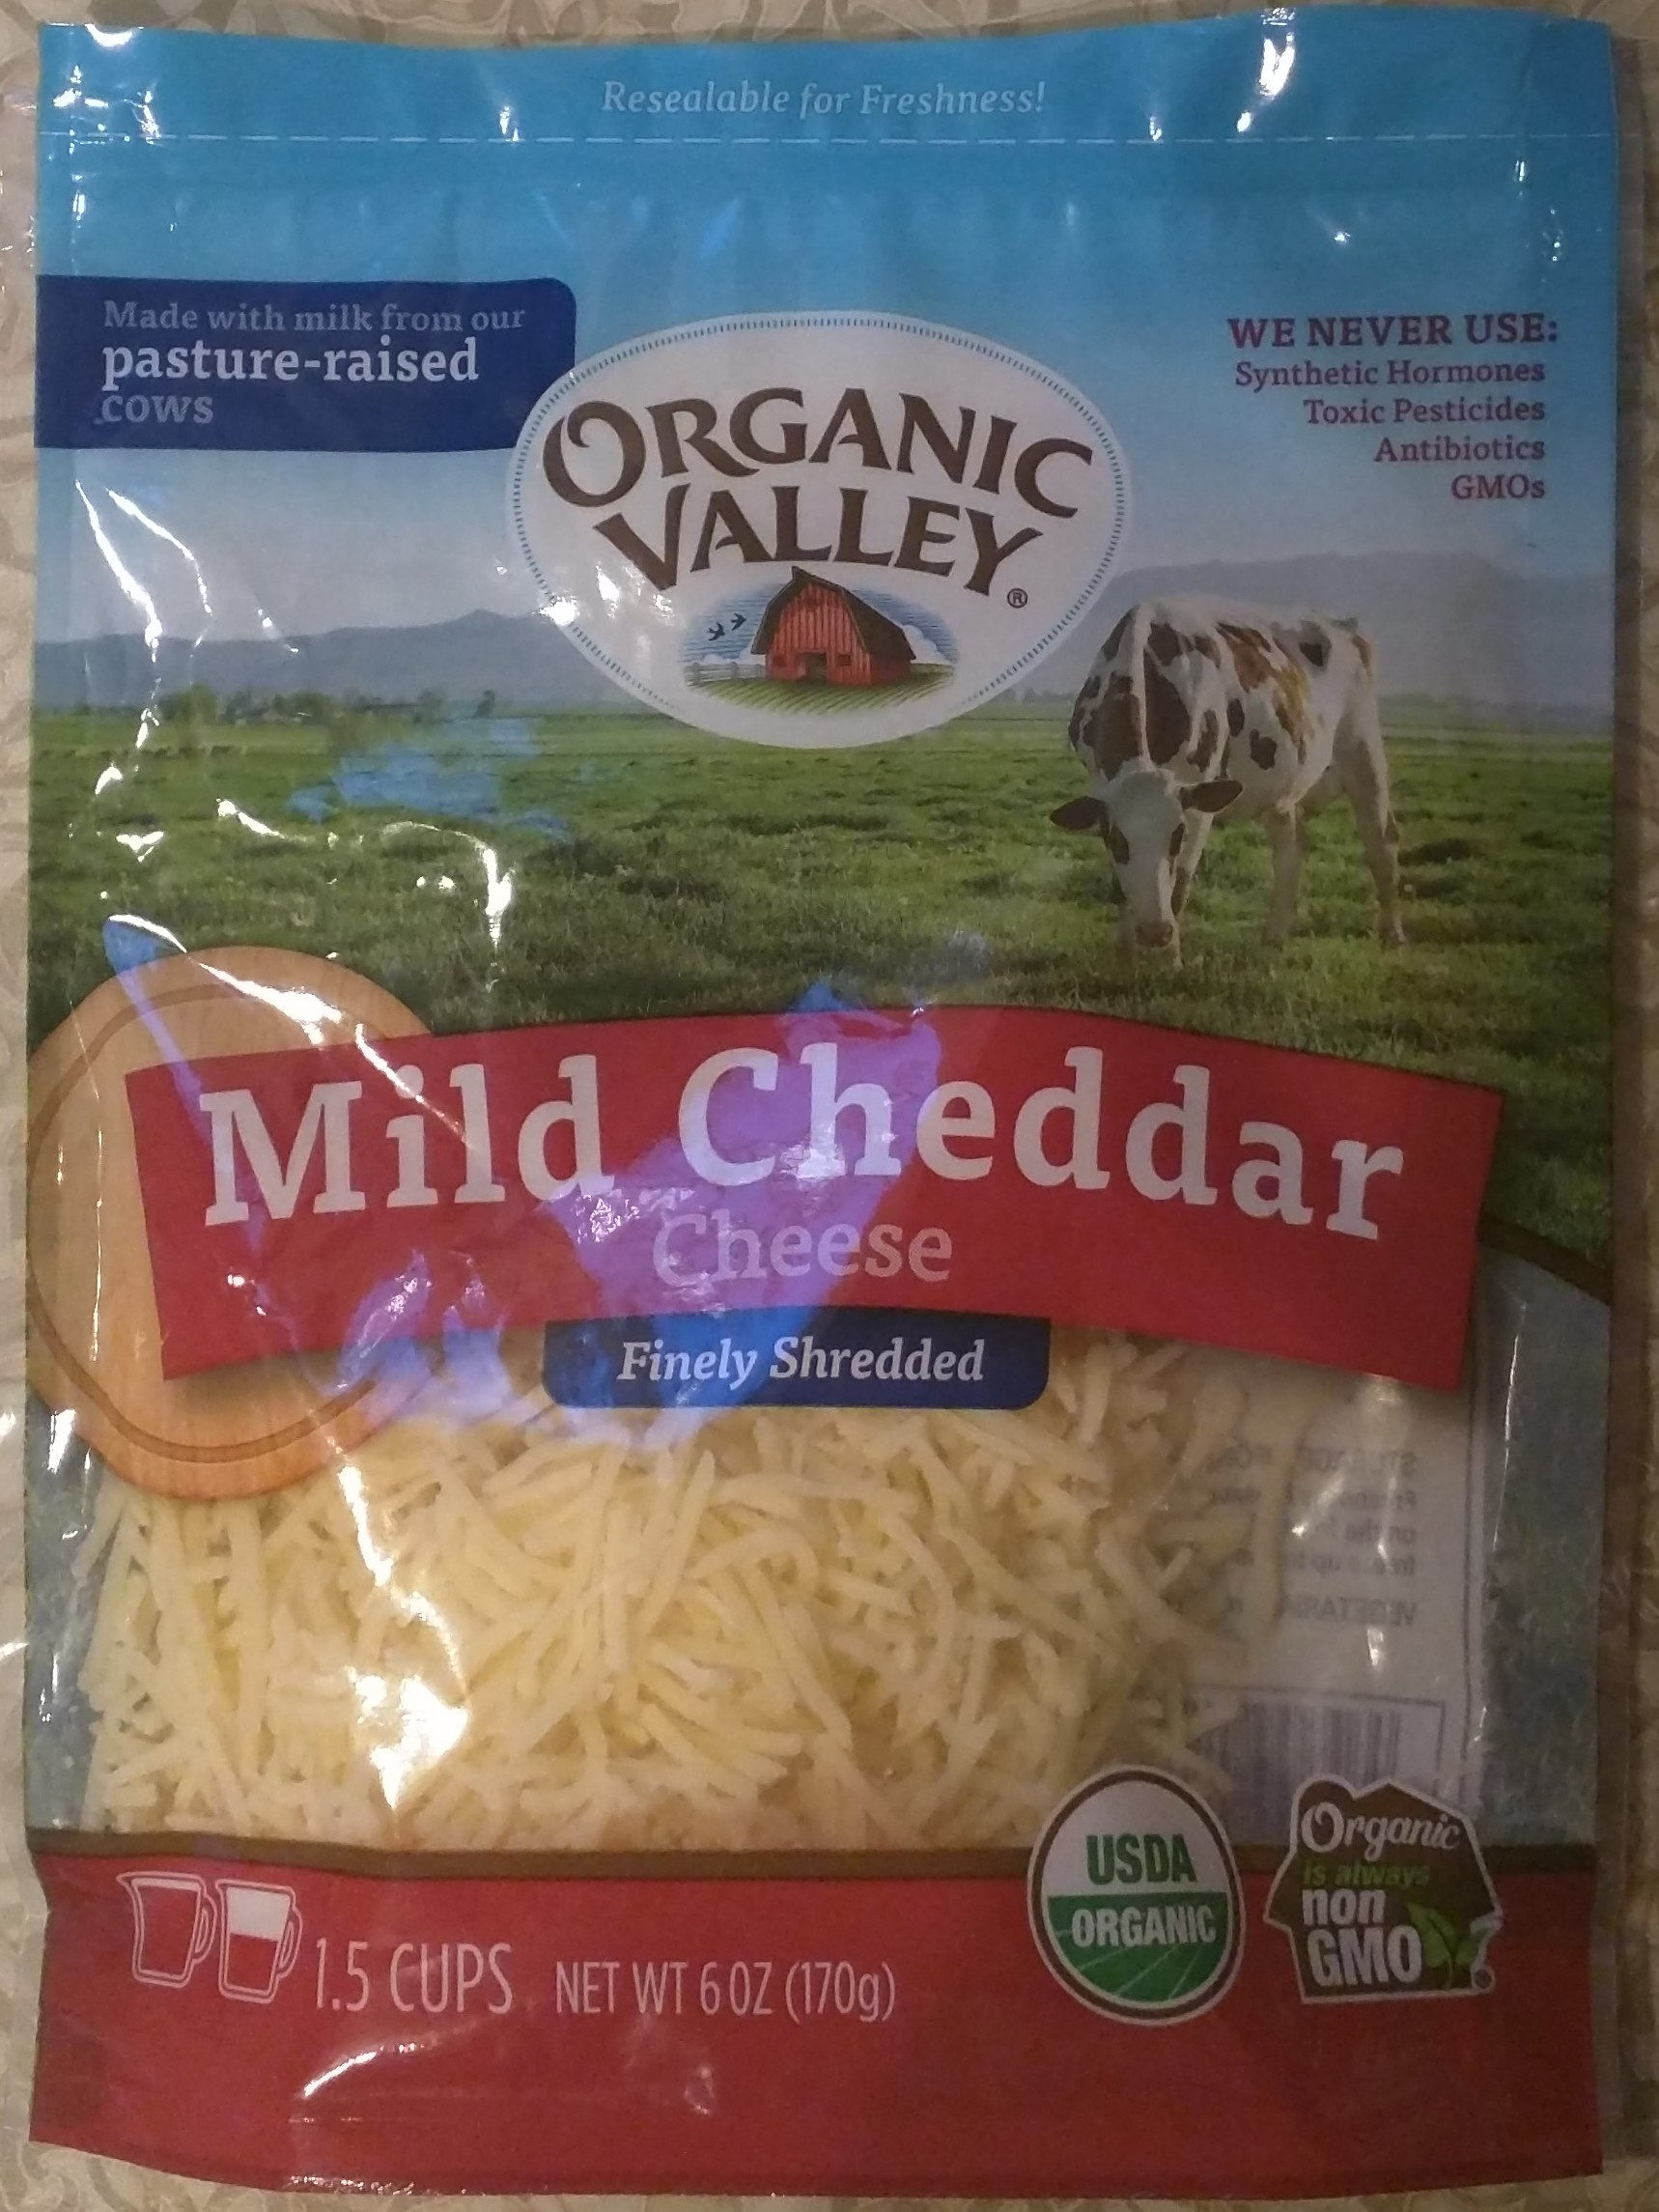 Organic valley, shredded cheddar cheese, mild - Product - en